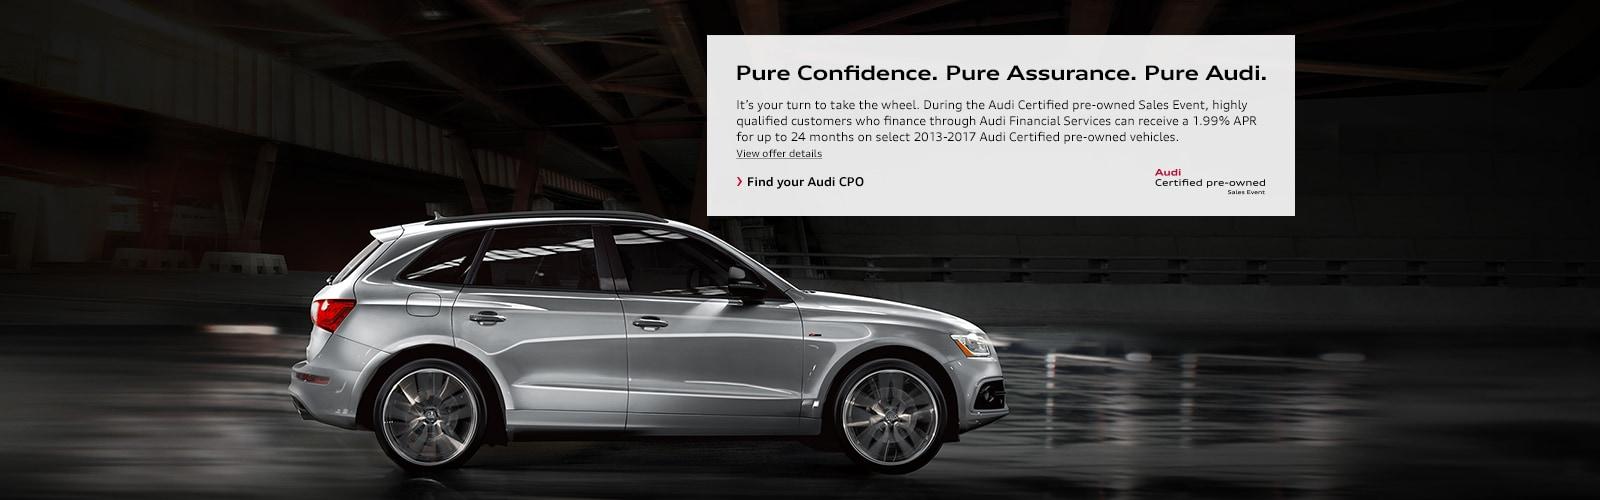 Audi Lakeland New And Used Car Dealership In Lakeland Near